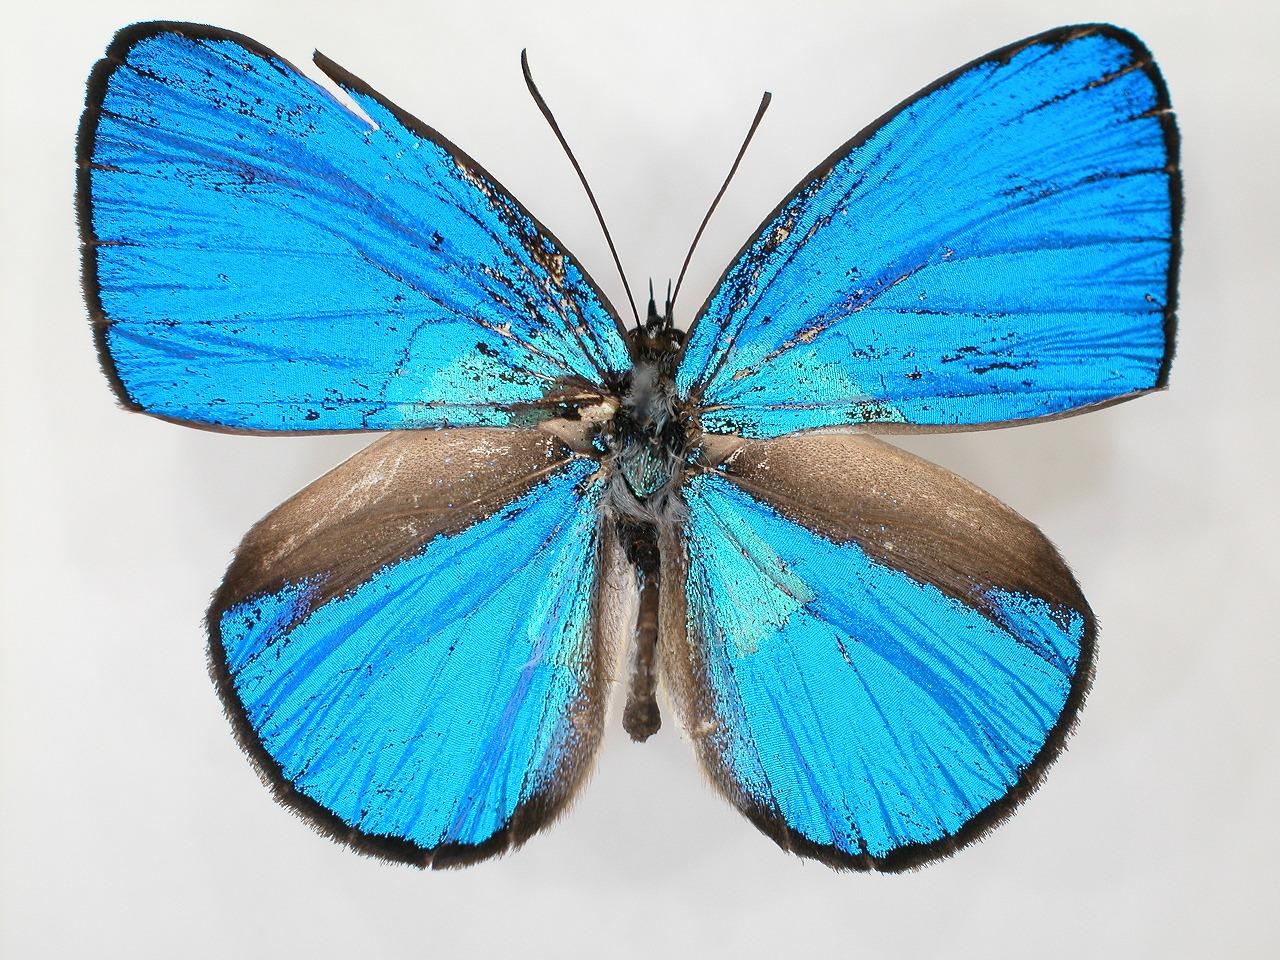 https://www.hitohaku.jp/material/l-material/butterfly-wing/5-lycaenidae/B1-273589_A.jpg